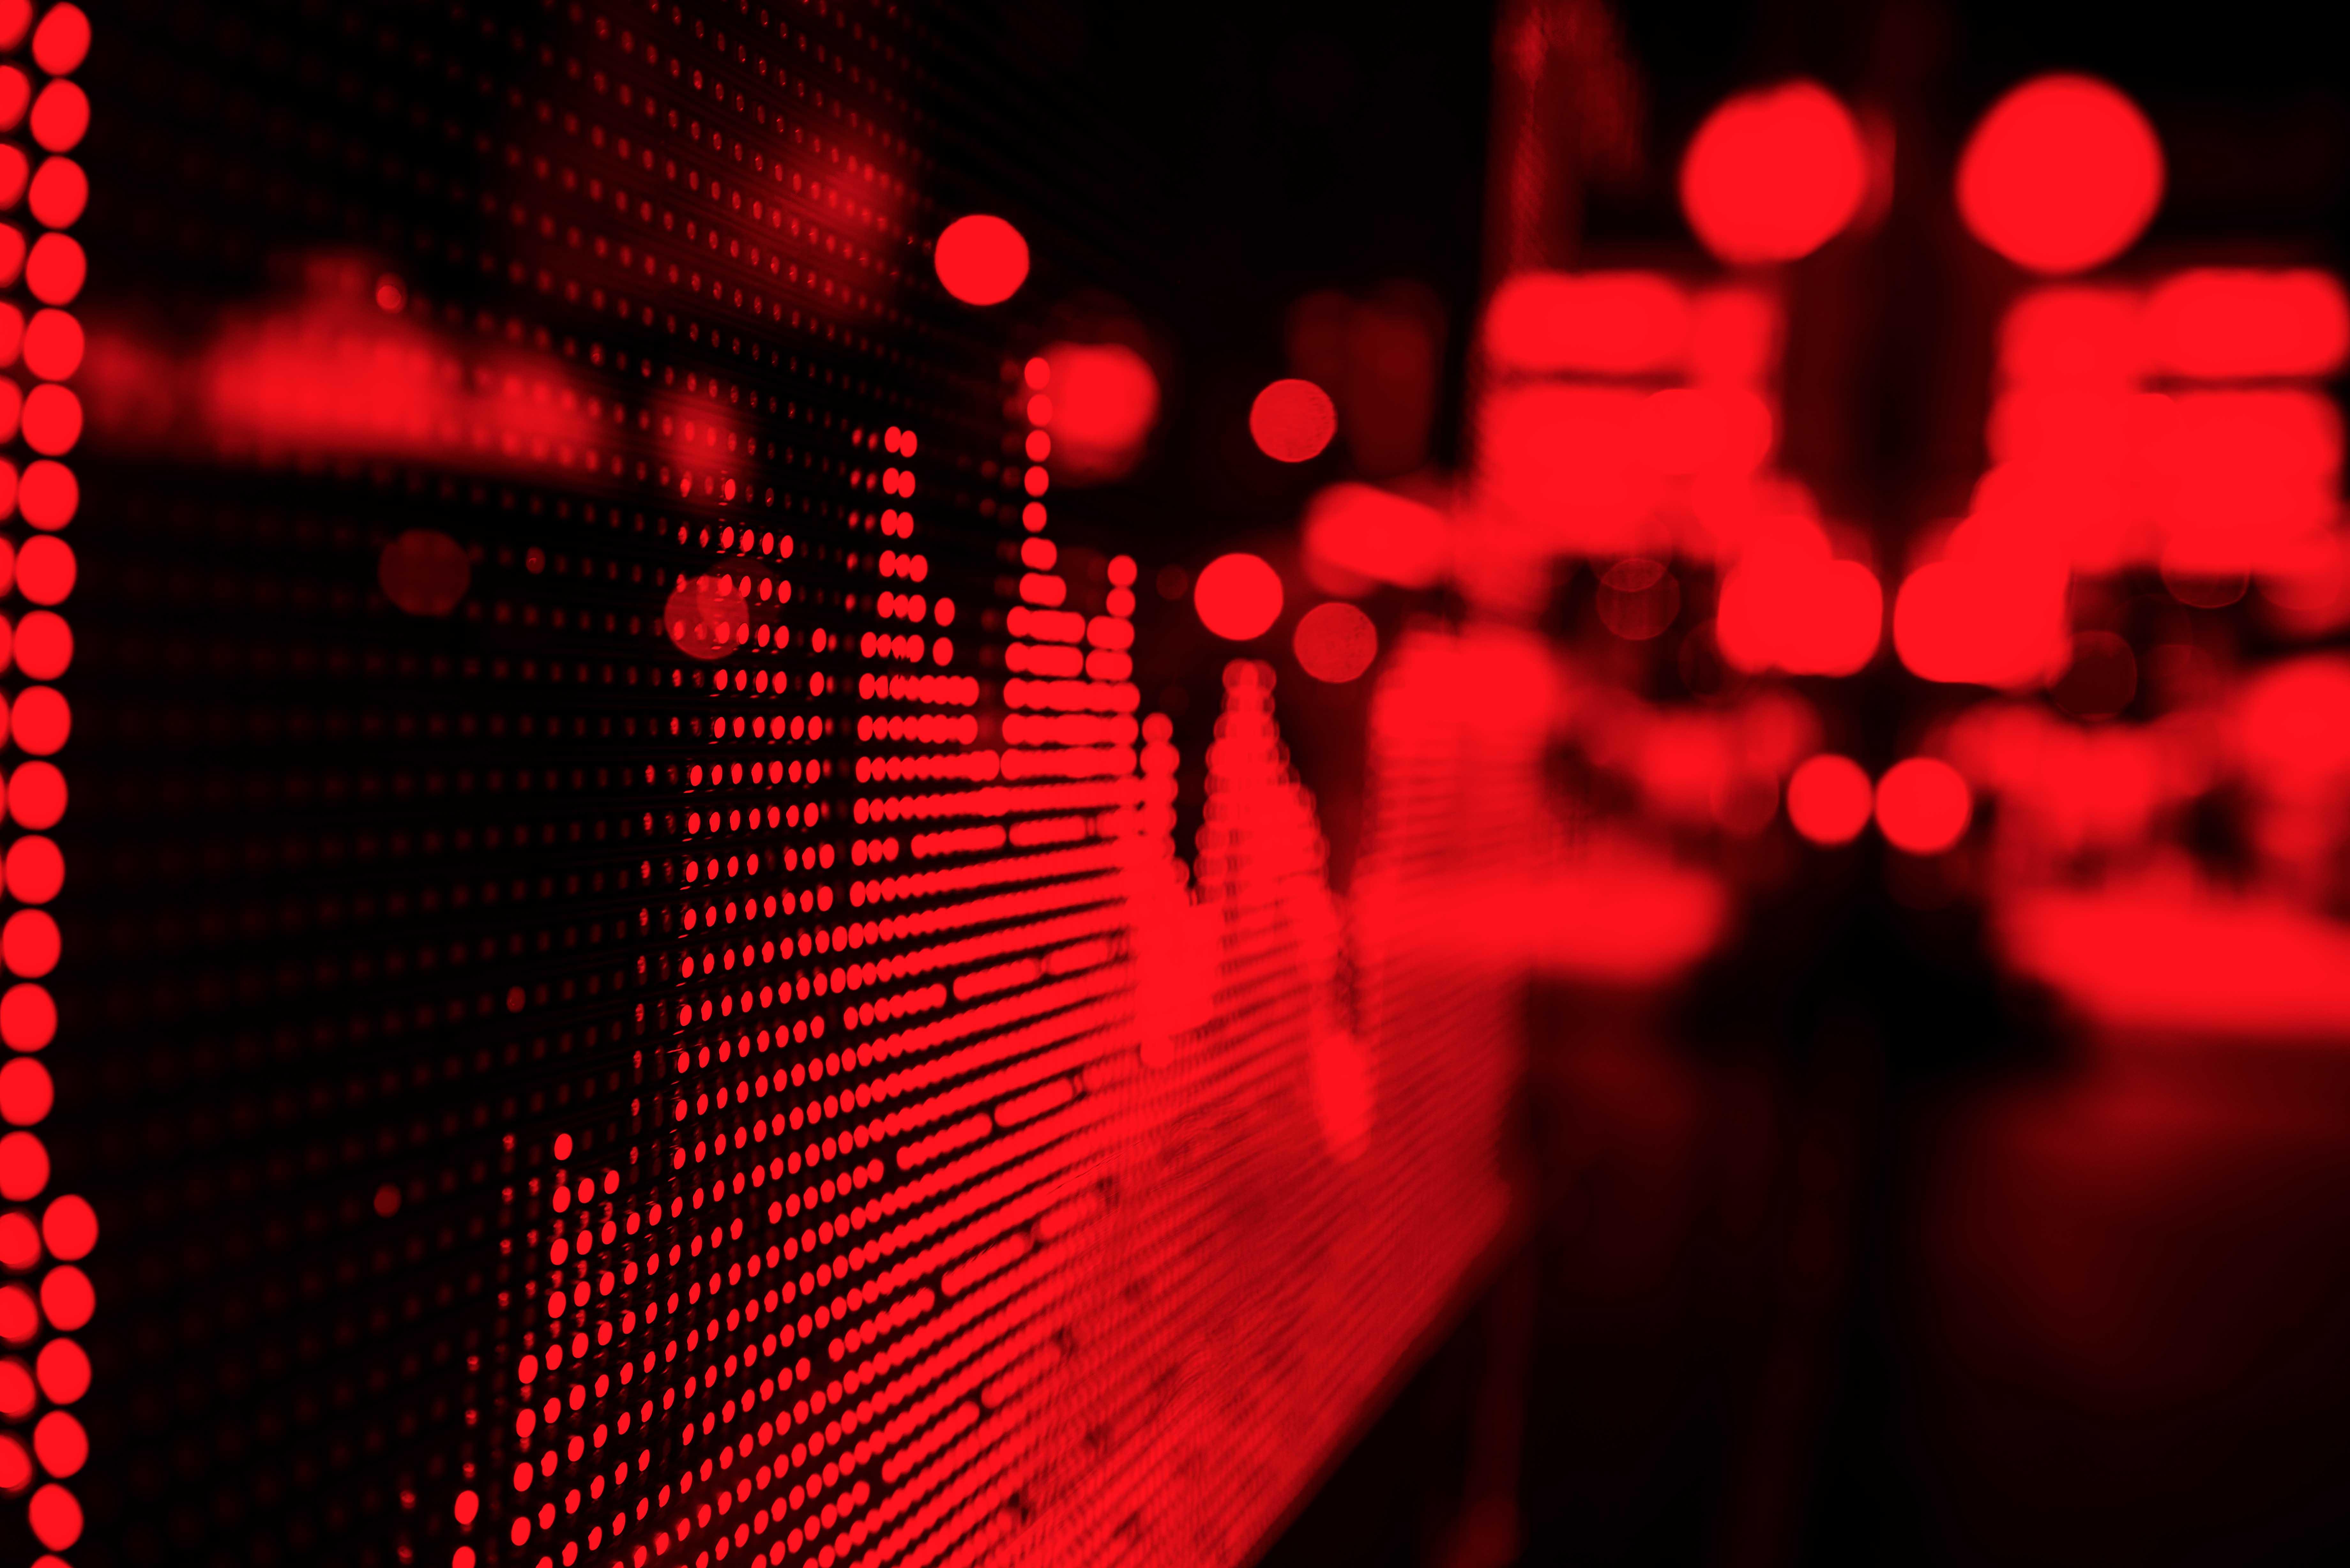 Data_Sign_Lights_Red.jpg